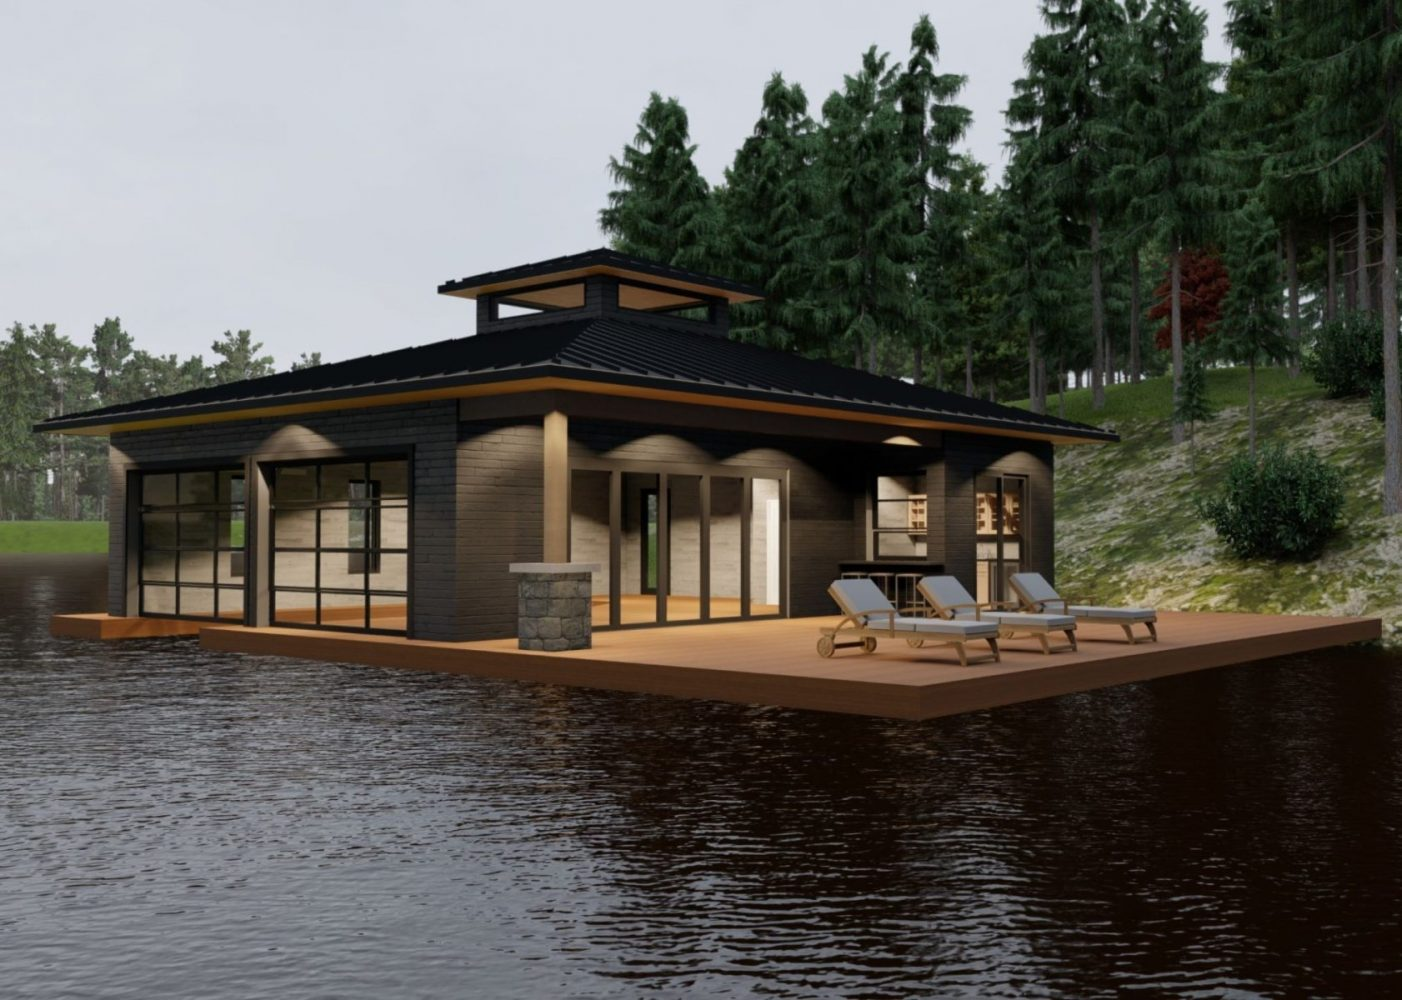 Contemporary one level Muskoka boathouse by PattyMac